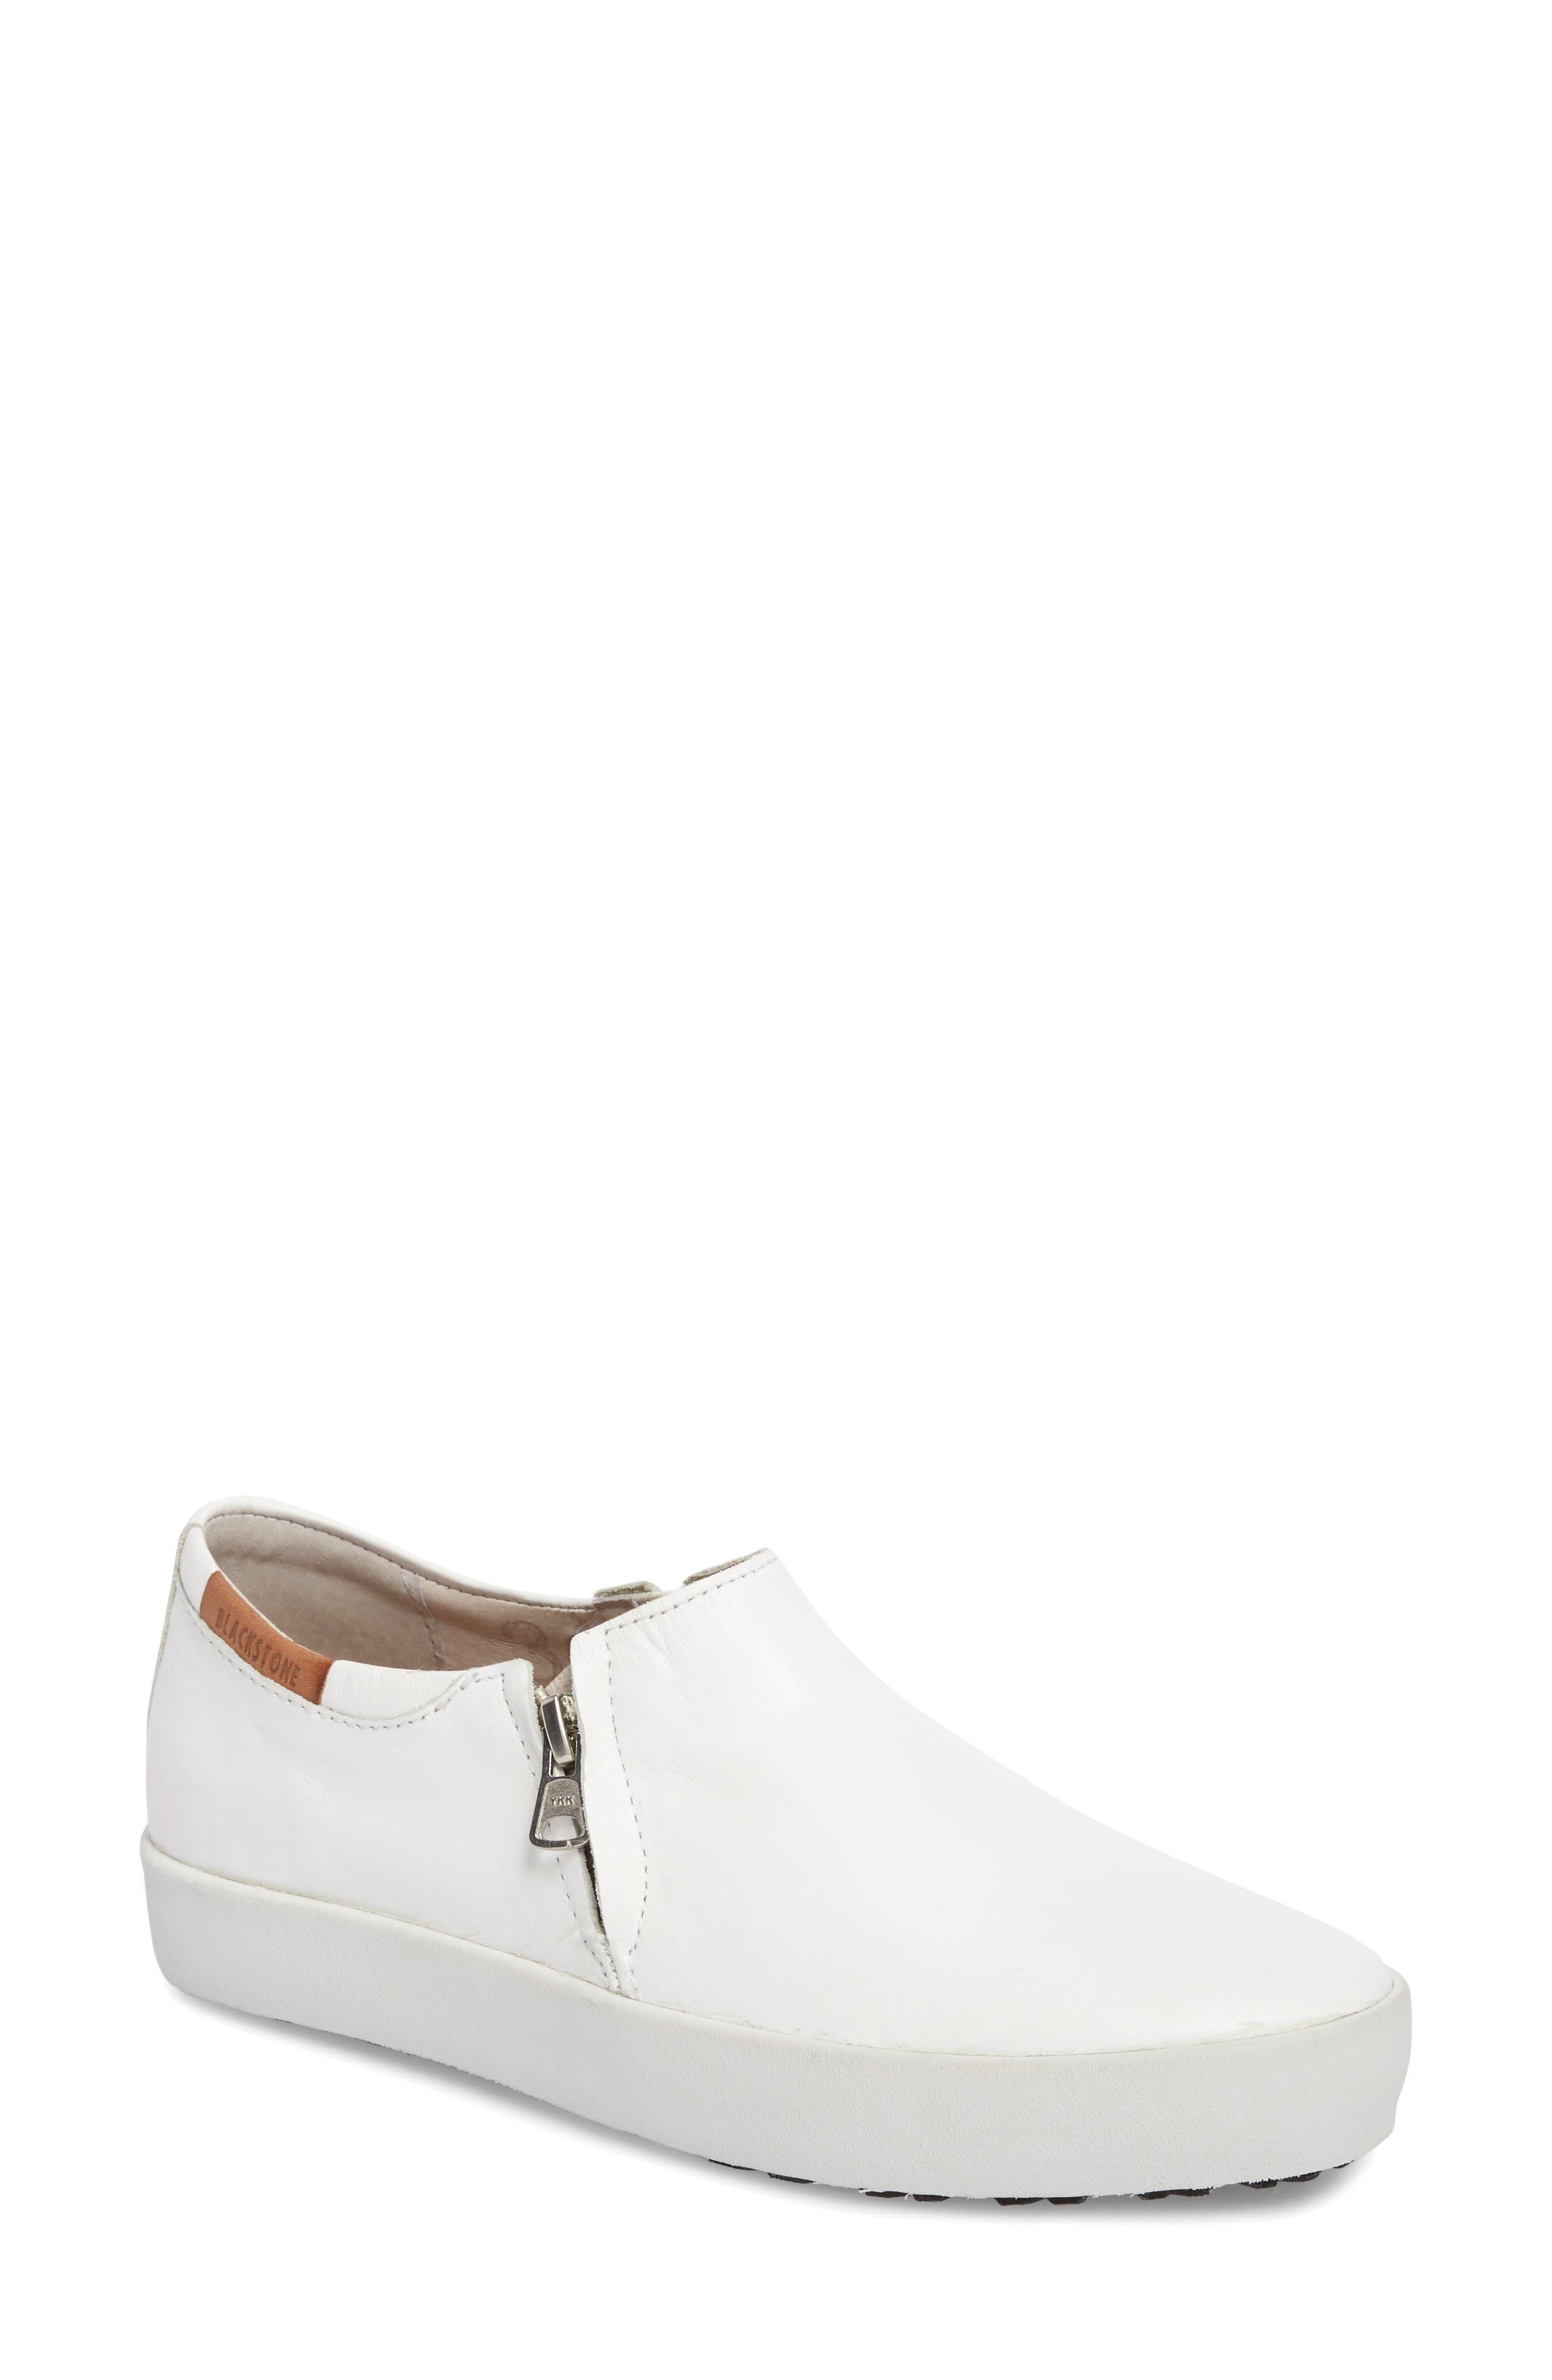 Blackstone Pl75 Slip-On Sneaker White